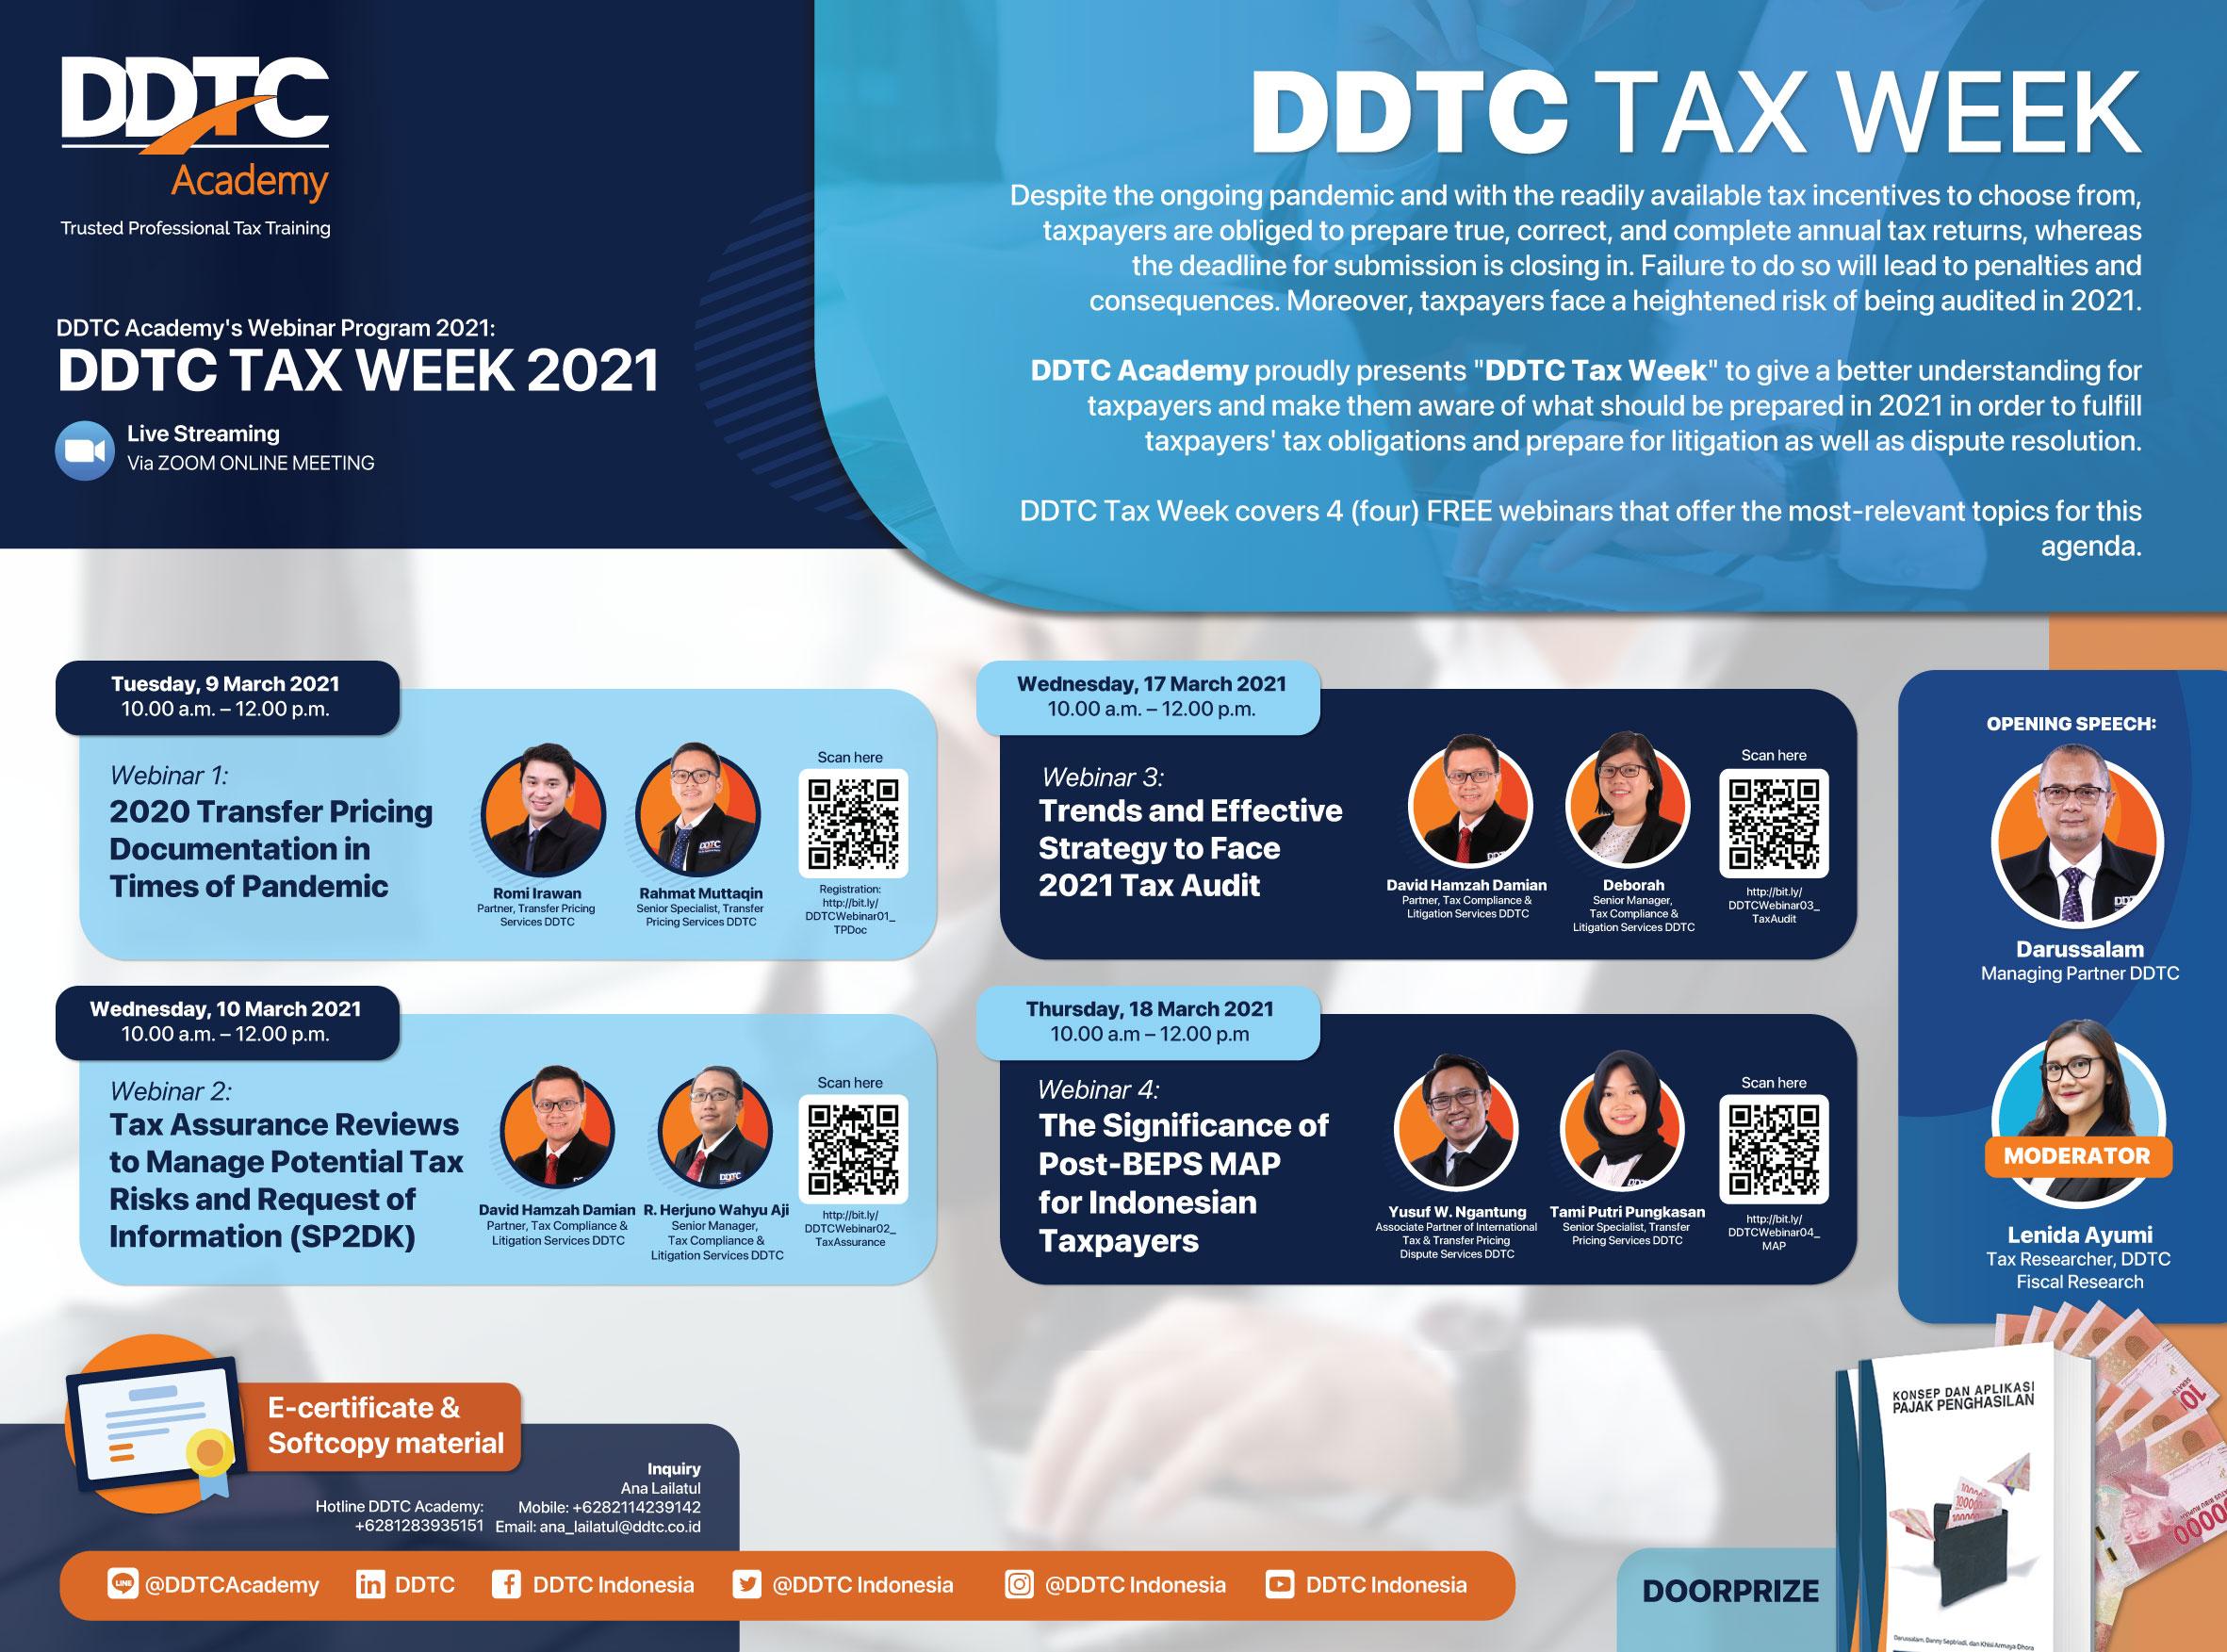 DDTC Tax Week Digelar! Ada 4 Webinar Pajak Gratis, Mau?